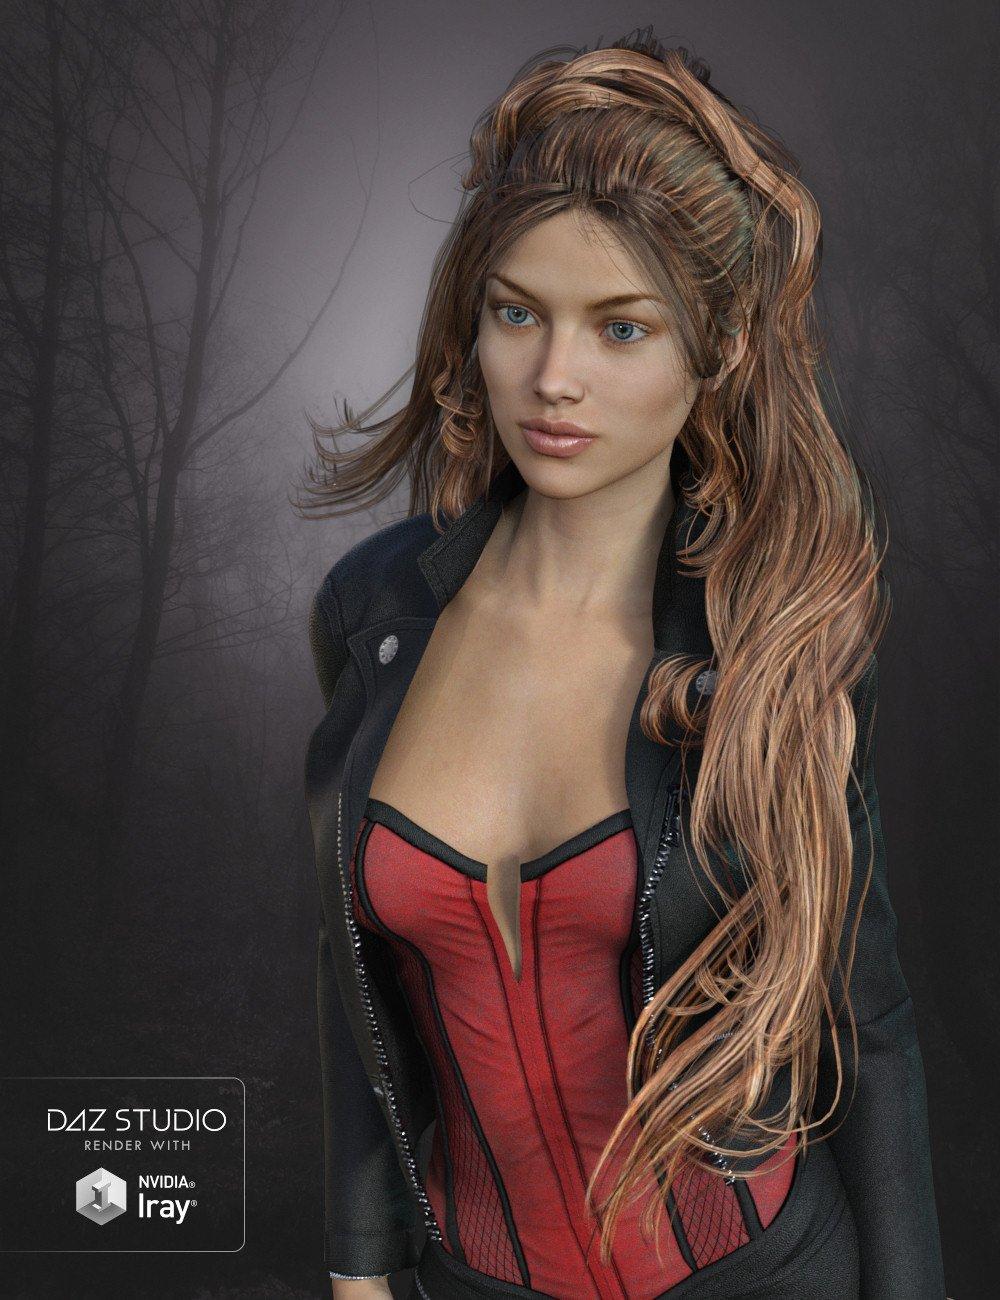 DragonFly Hair Genesis 3 Female(s), Genesis 2 Female(s) and V4 by: goldtassel, 3D Models by Daz 3D